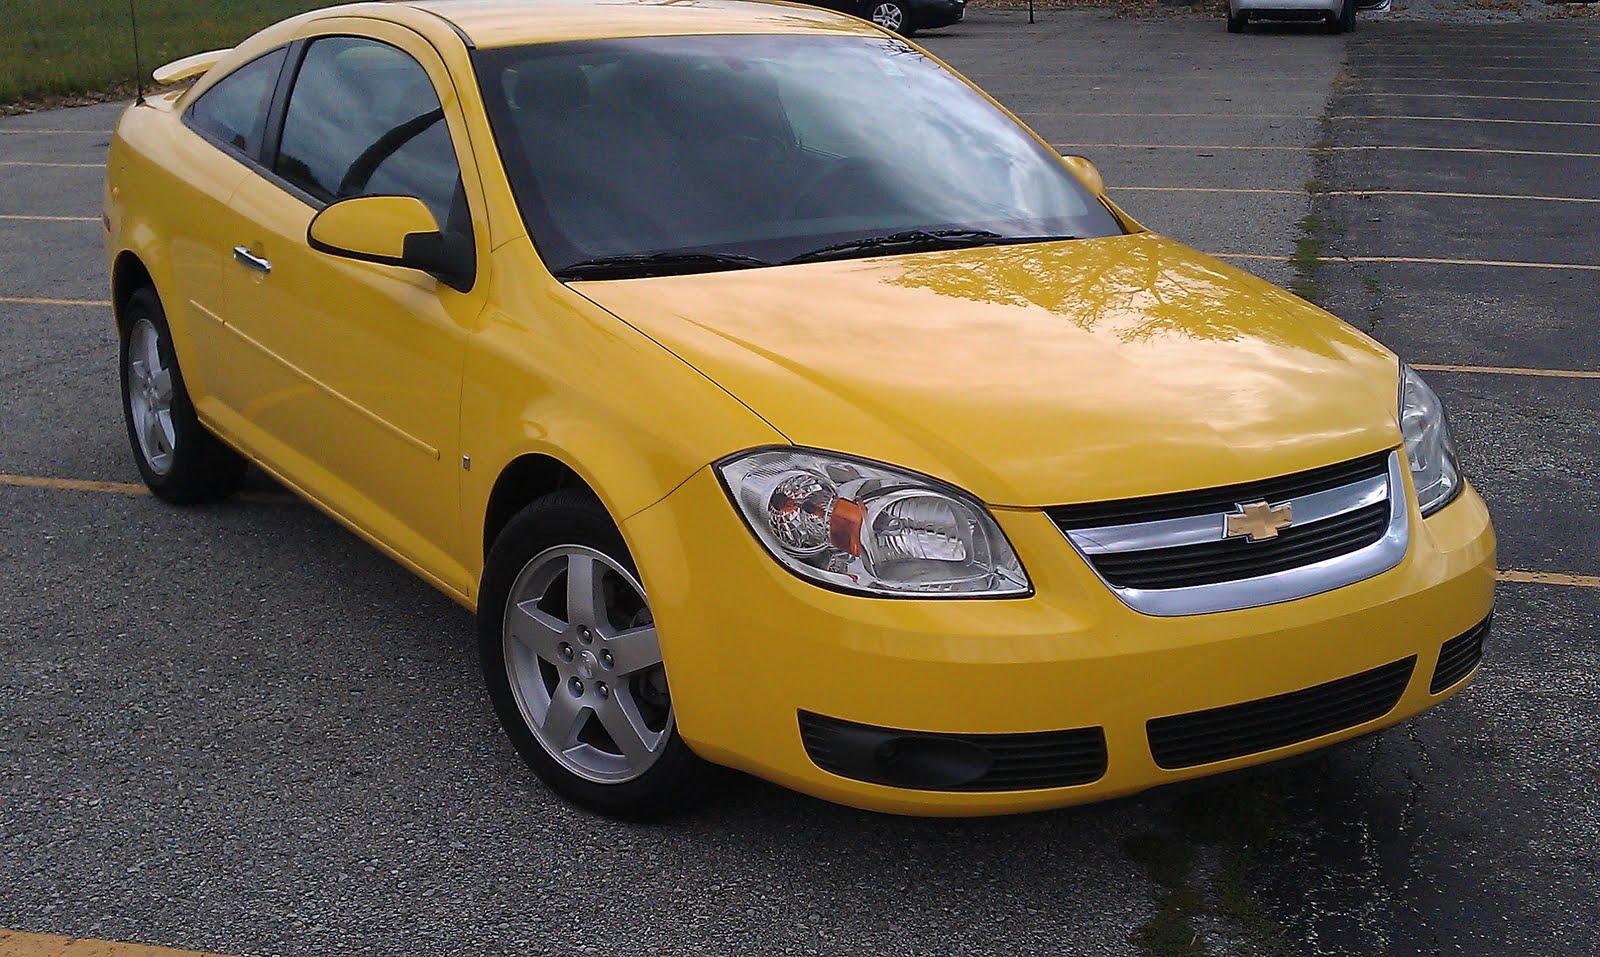 Cobalt chevy cobalt lt 2009 : Mark H. @ Eriks Chevrolet: 2009 Chevy Cobalt LT Coupe Rally Yellow!!